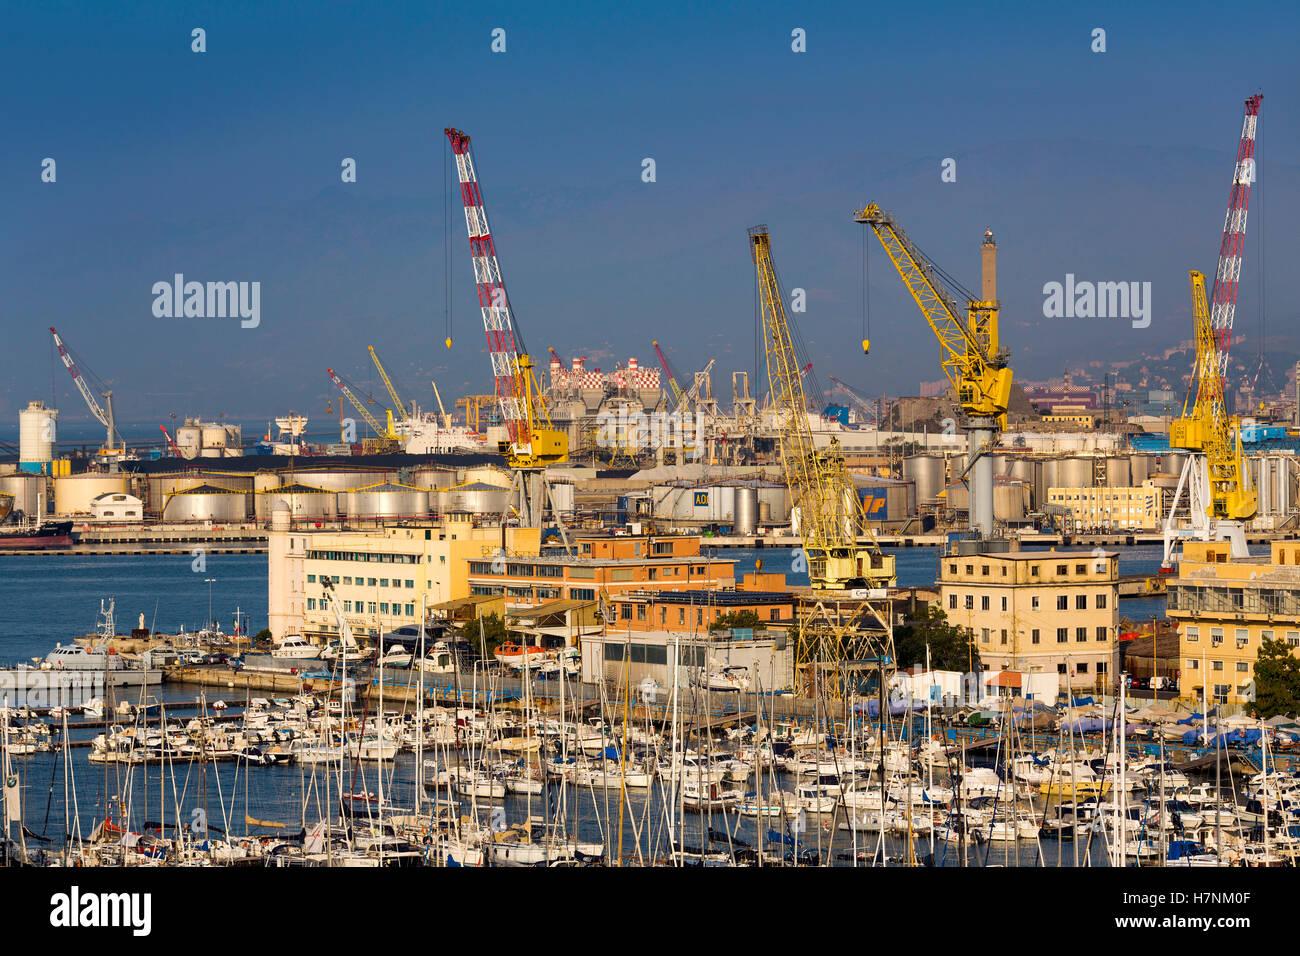 The harbour of Genoa. Mediterranean Sea. Liguria, Italy Europe - Stock Image